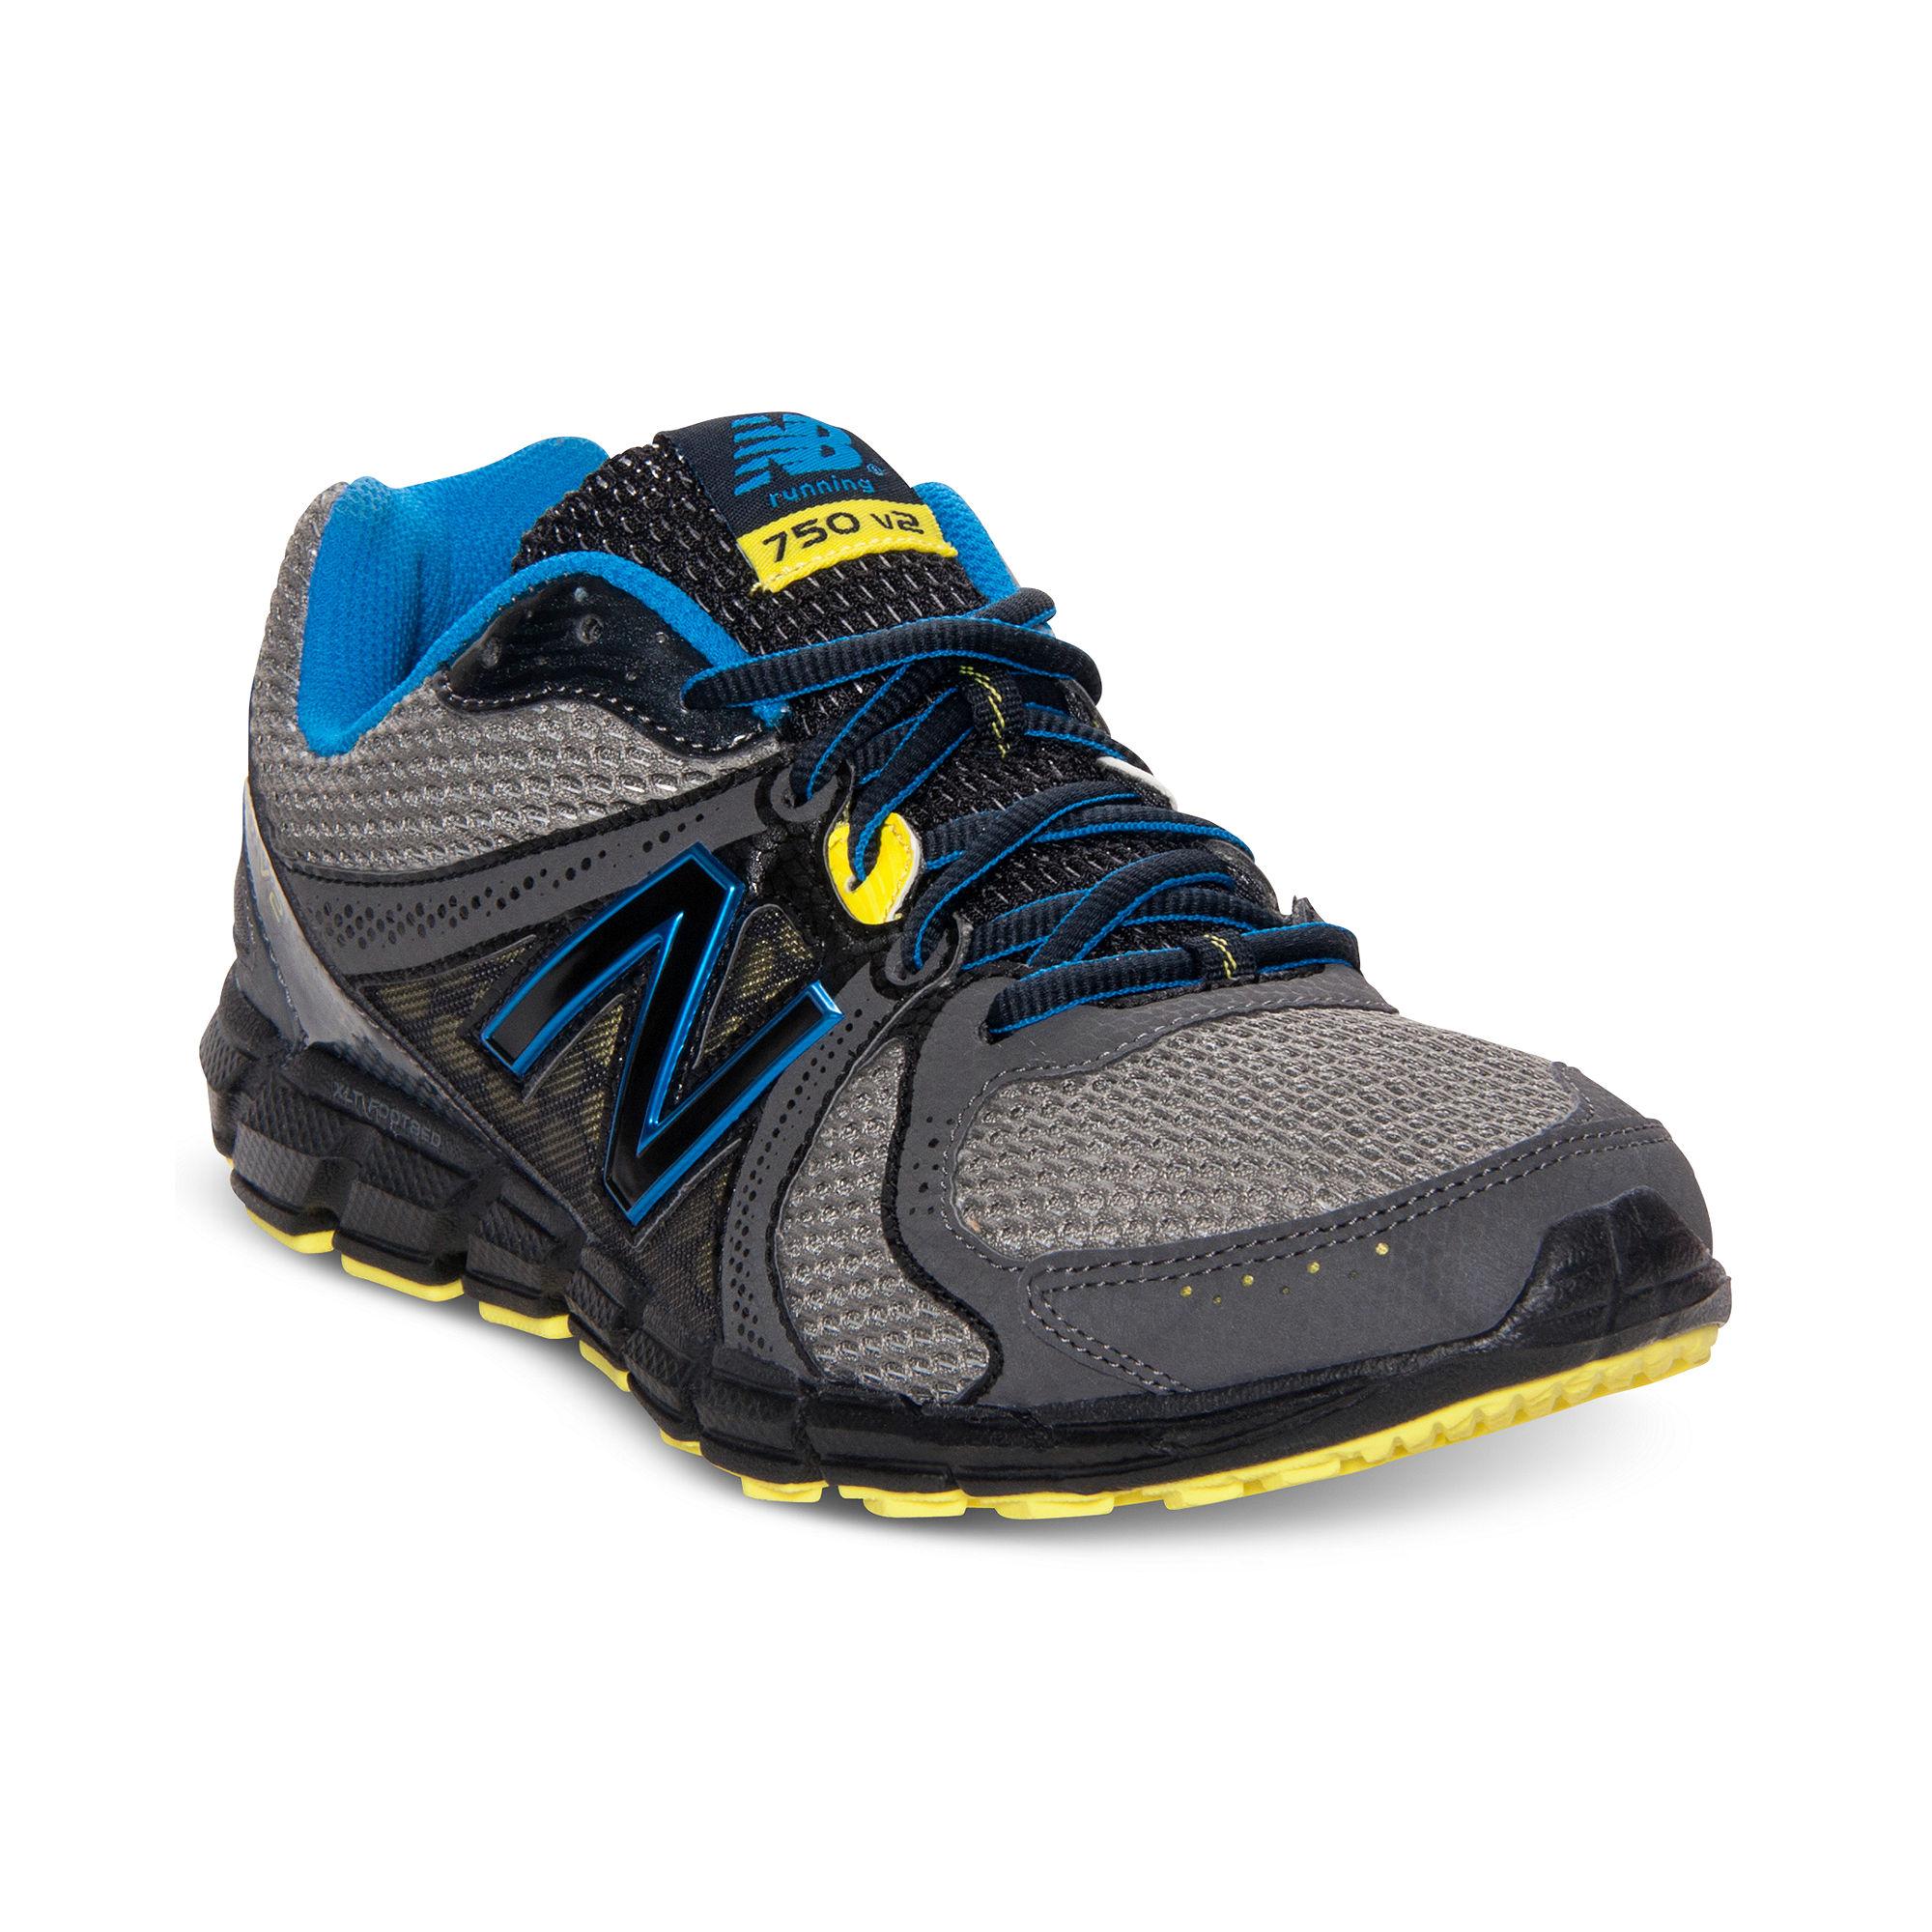 f9b561c114da ... coupon code for lyst new balance 750 running sneakers in gray for men  db2e9 806da